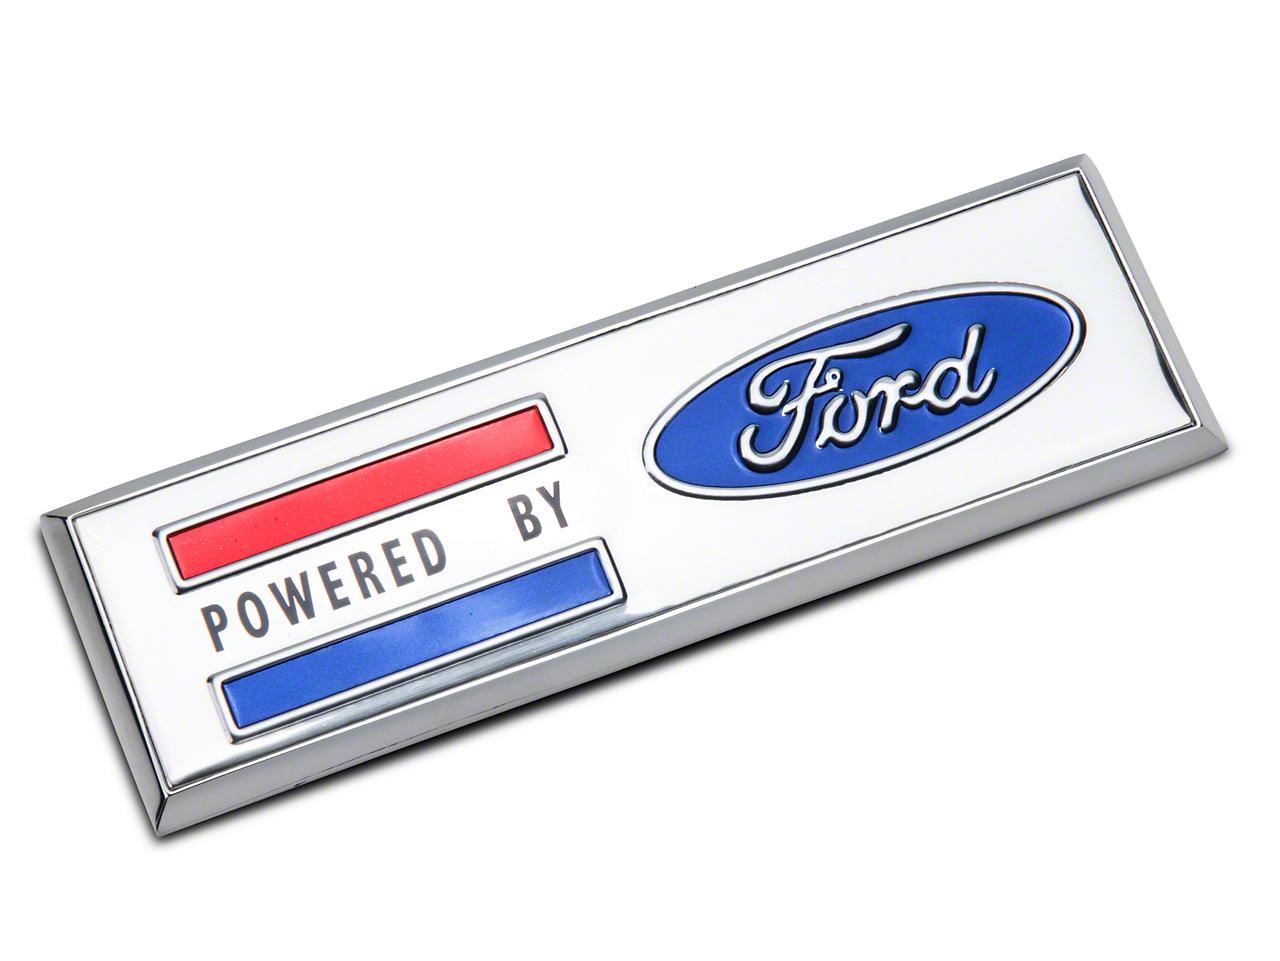 SpeedForm Powered By Ford Emblem